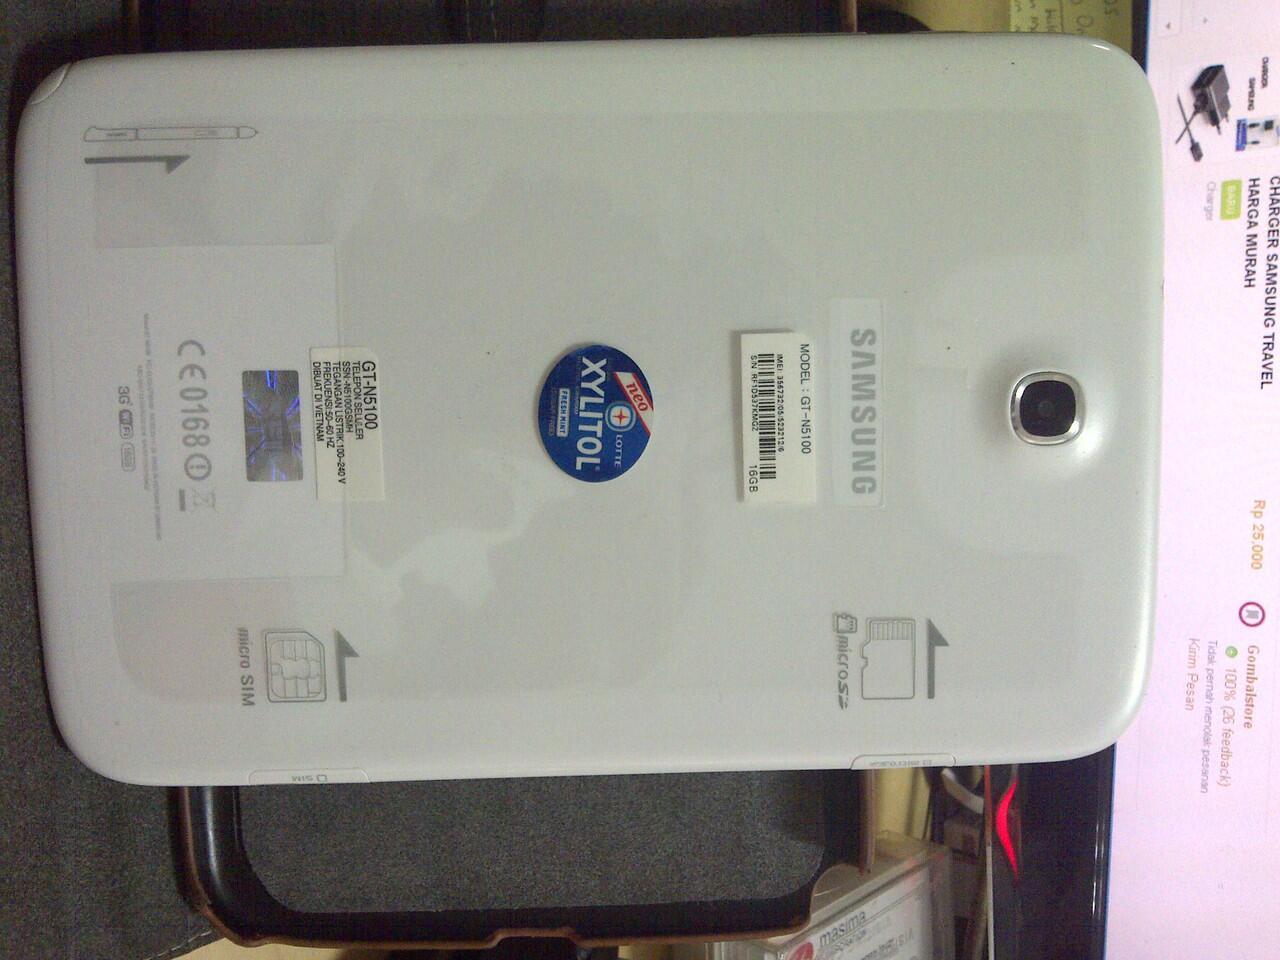 jual sansung note 8.0 N5100 White baru 4 bln pemakaian